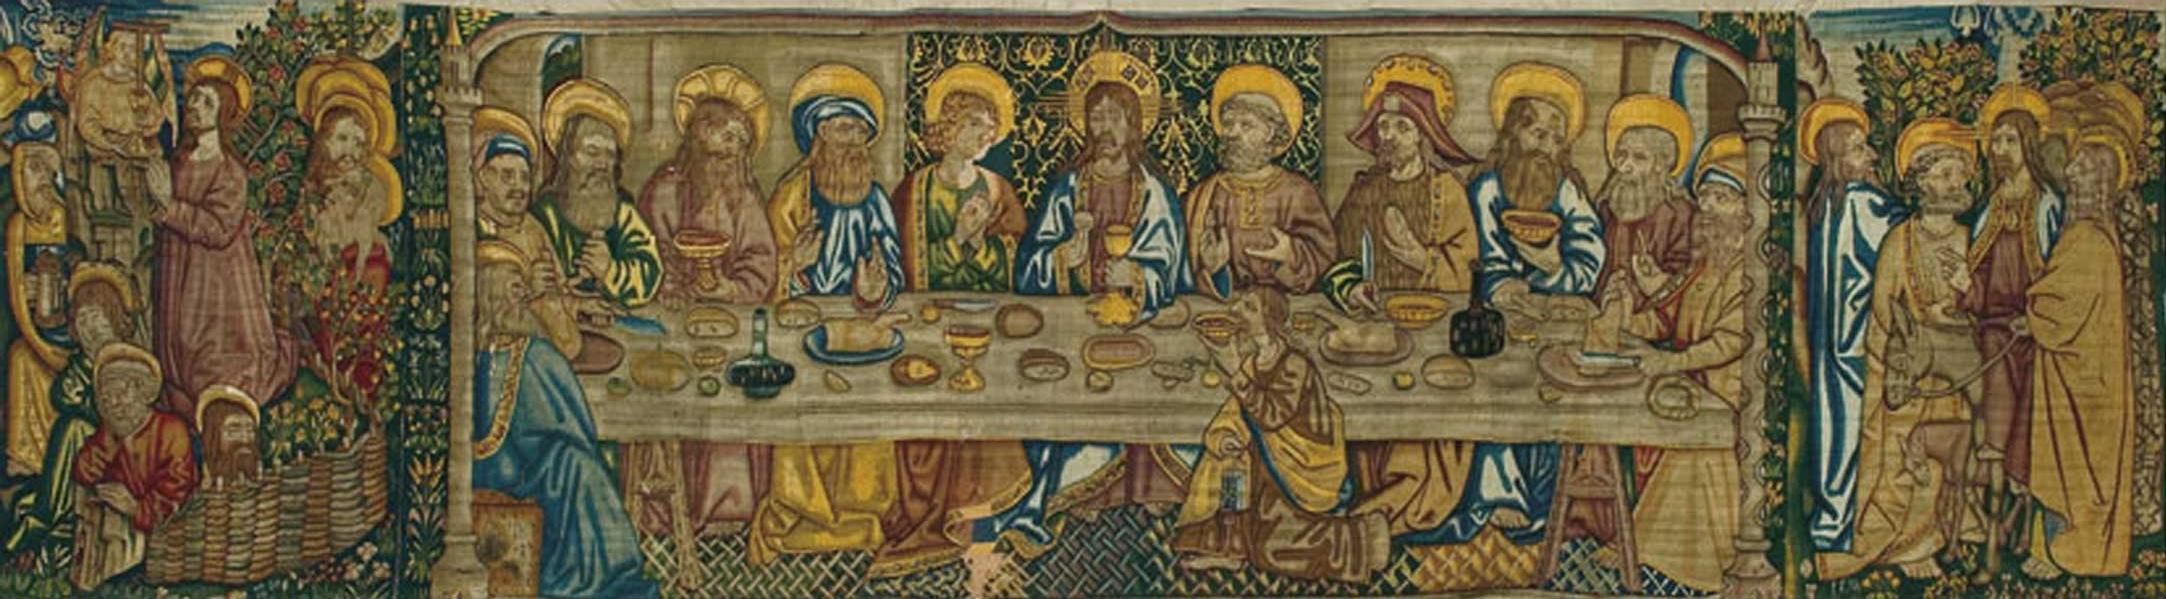 El Tapiz de la Santa Cena de la catedral de Tortosa. Autor, laluzdelasimagenes.net